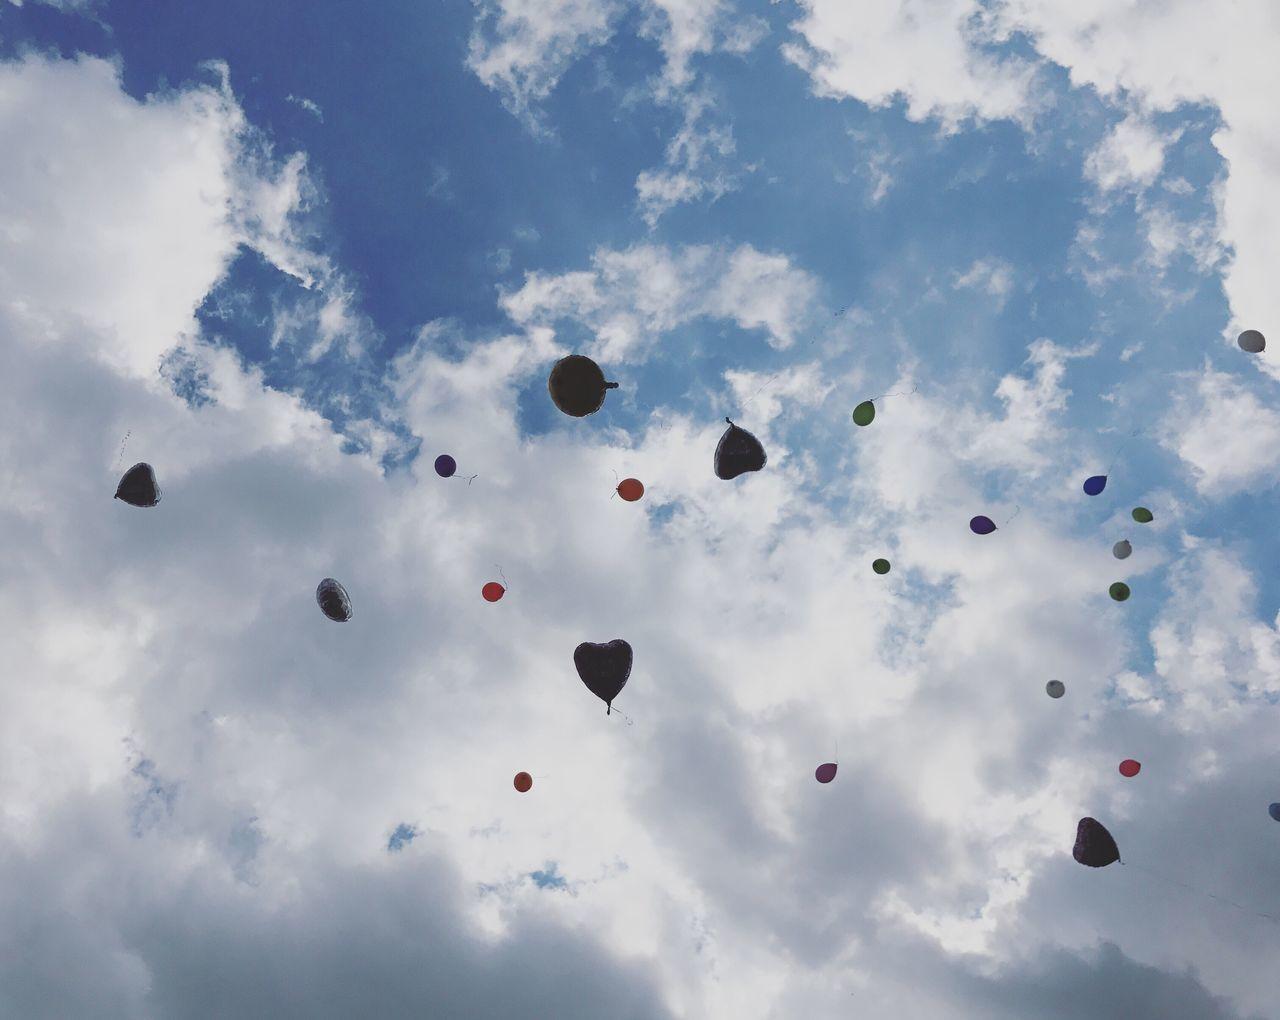 Sky Balloons Heart Party Wedding Wedding Photography Celebration Berlin